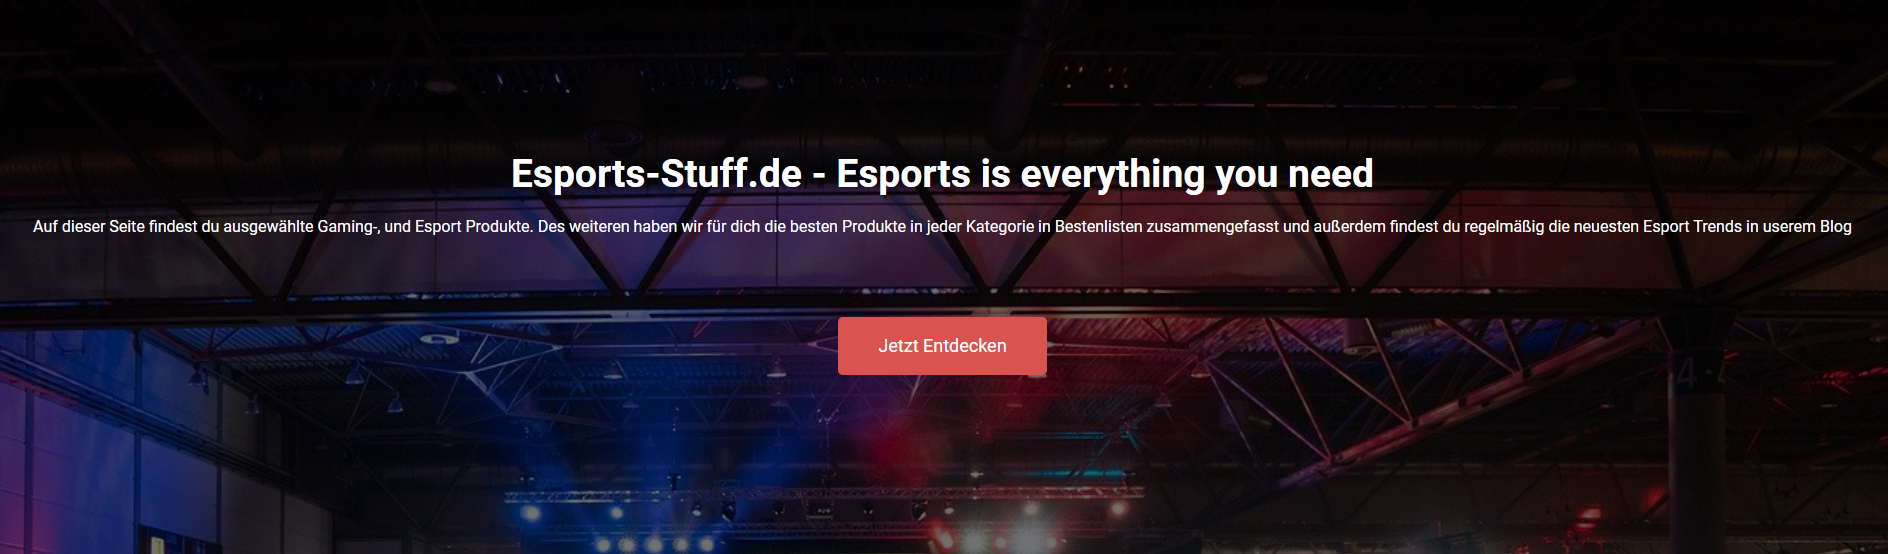 esports-stuff.de